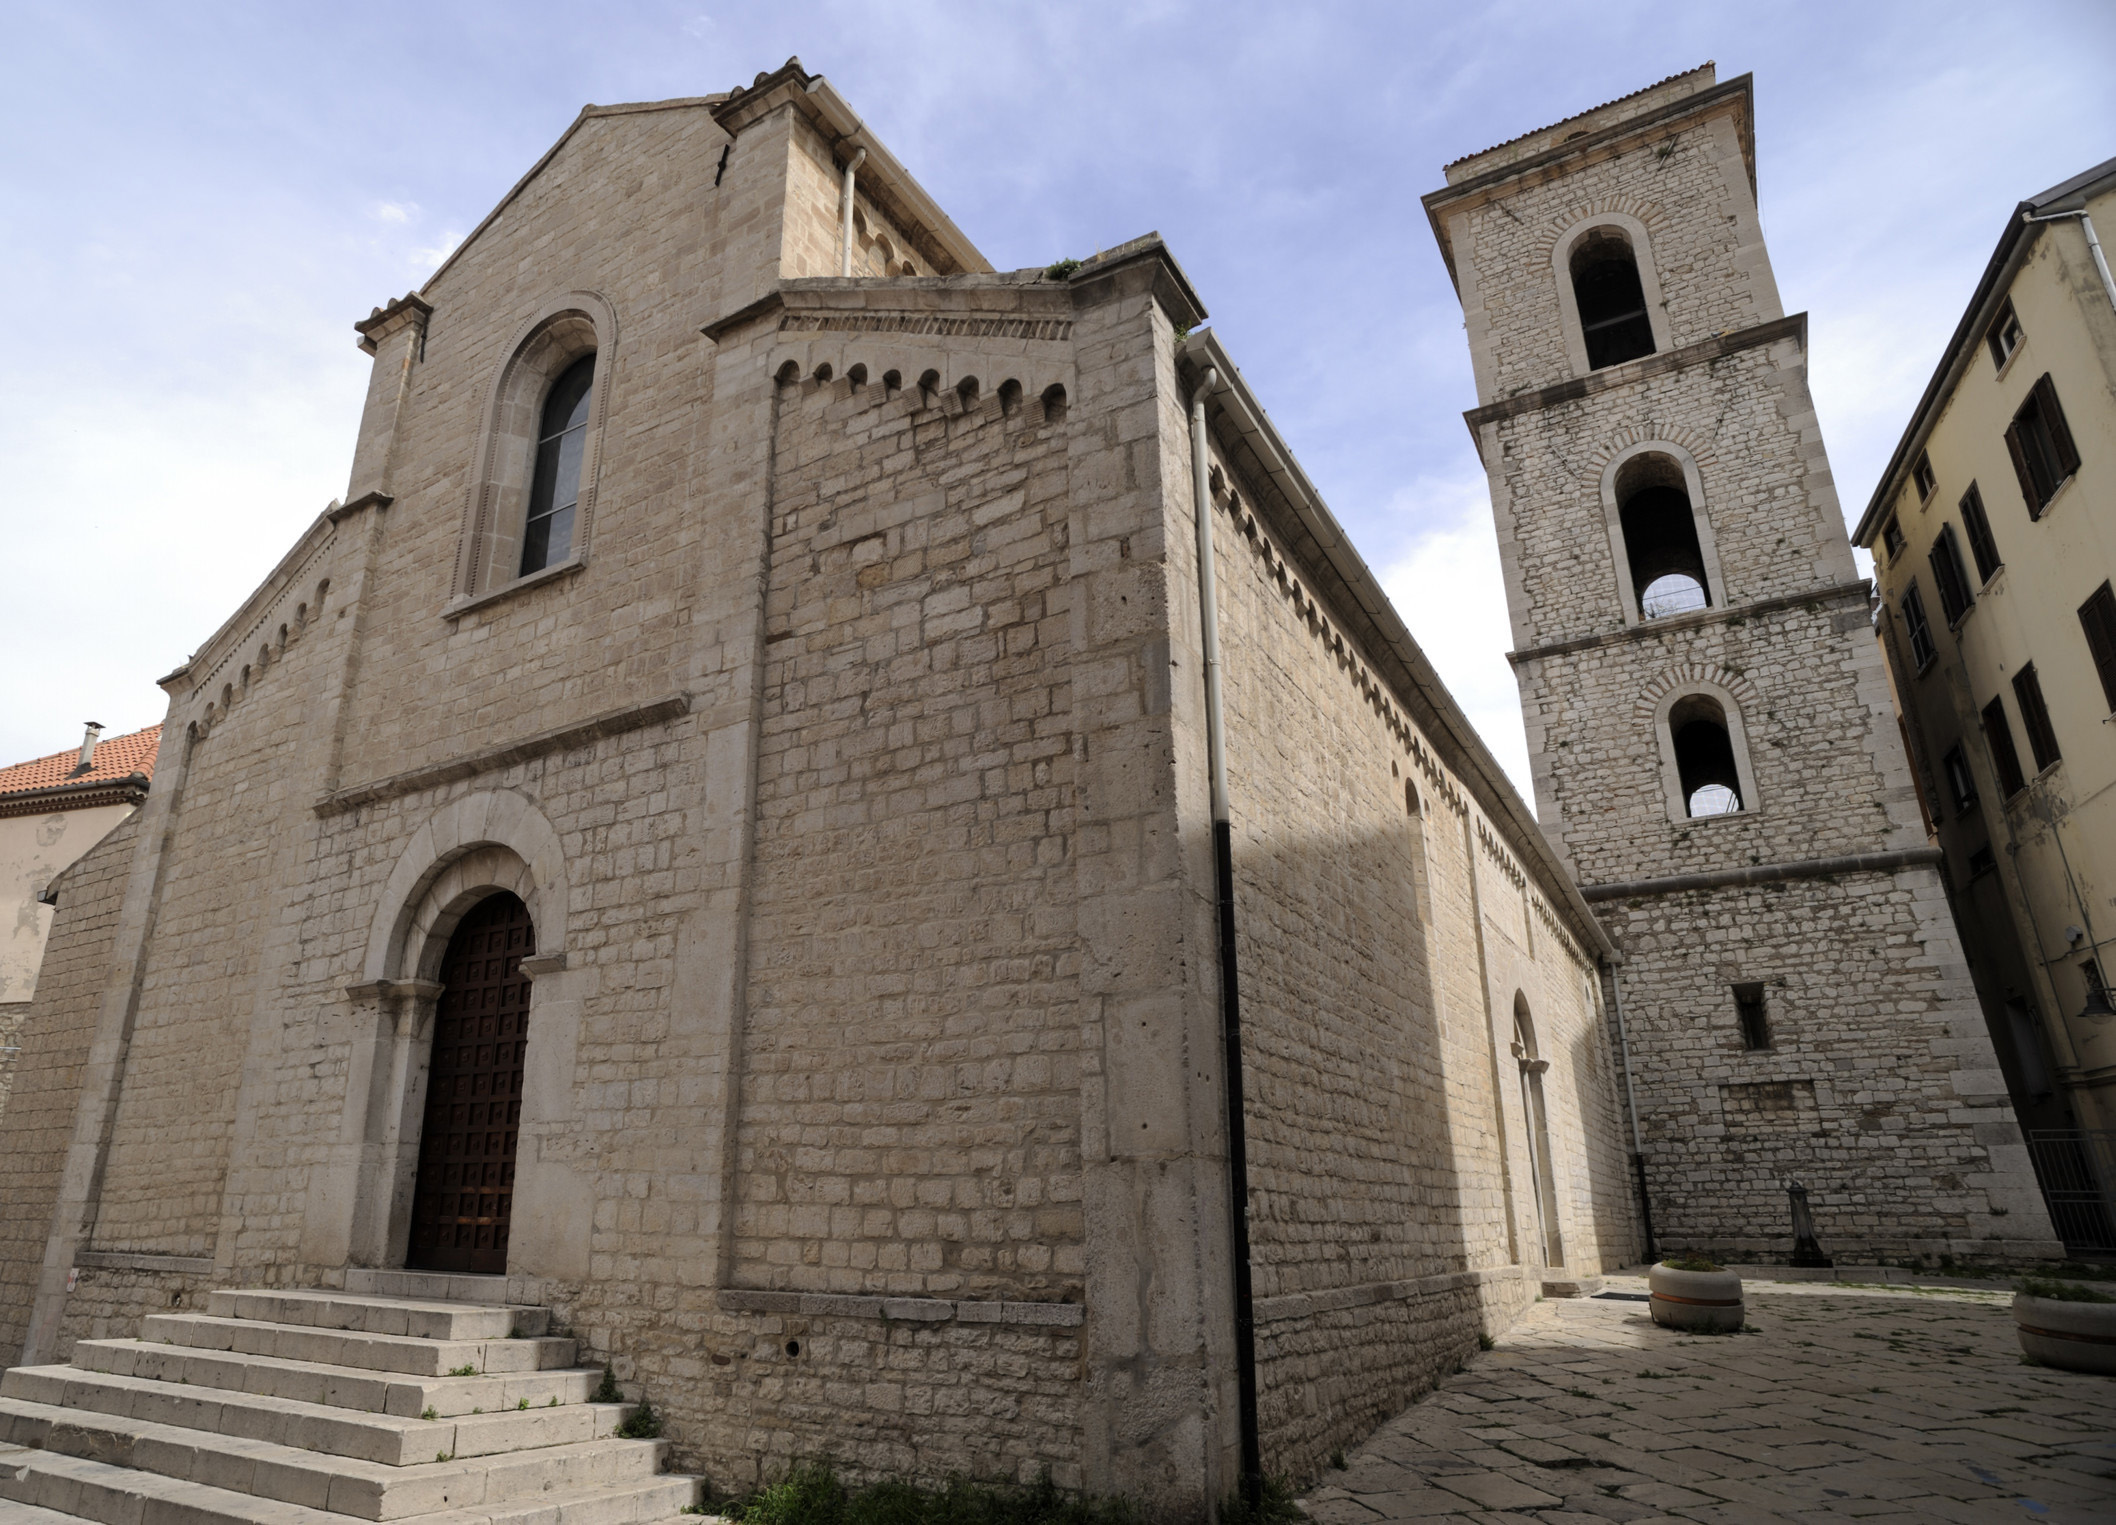 church of san michele arcangelo, potenza, basilicata, italy